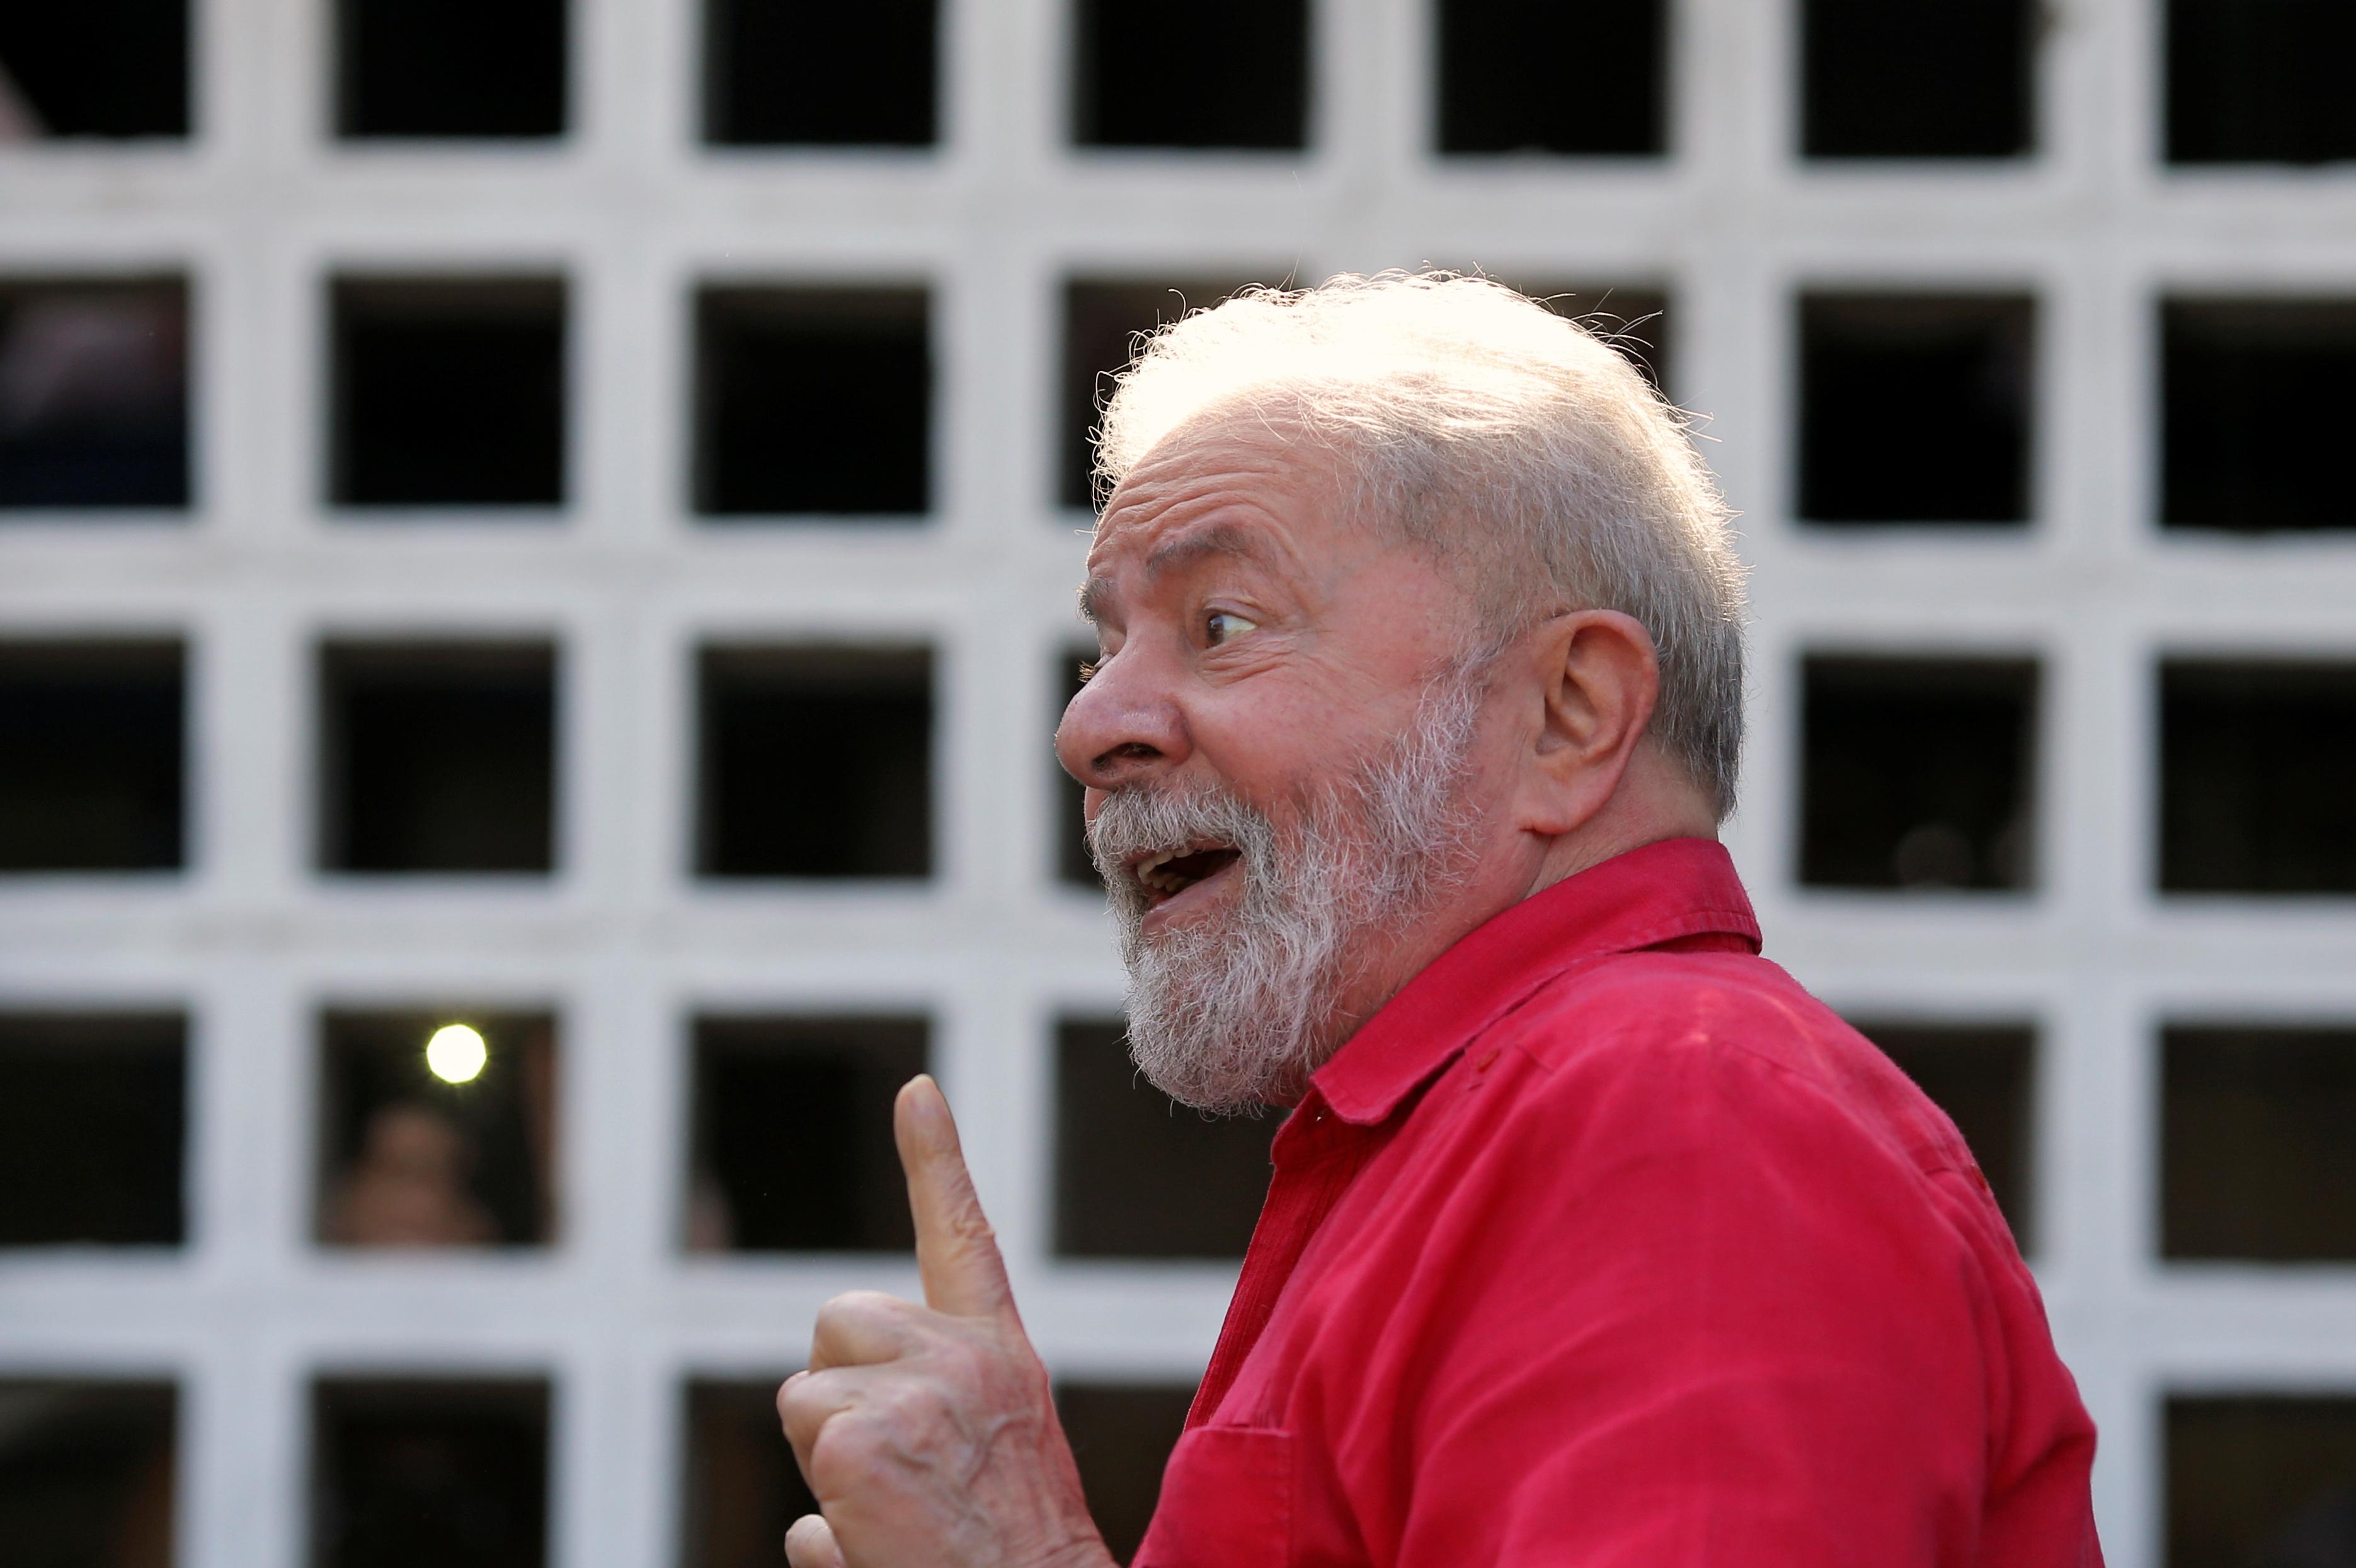 Former Brazil's President Luiz Inacio Lula da Silva gestures after voting at a polling station during the municipal elections in Sao Bernardo do Campo, Brazil, November 15, 2020. REUTERS/Amanda Perobelli